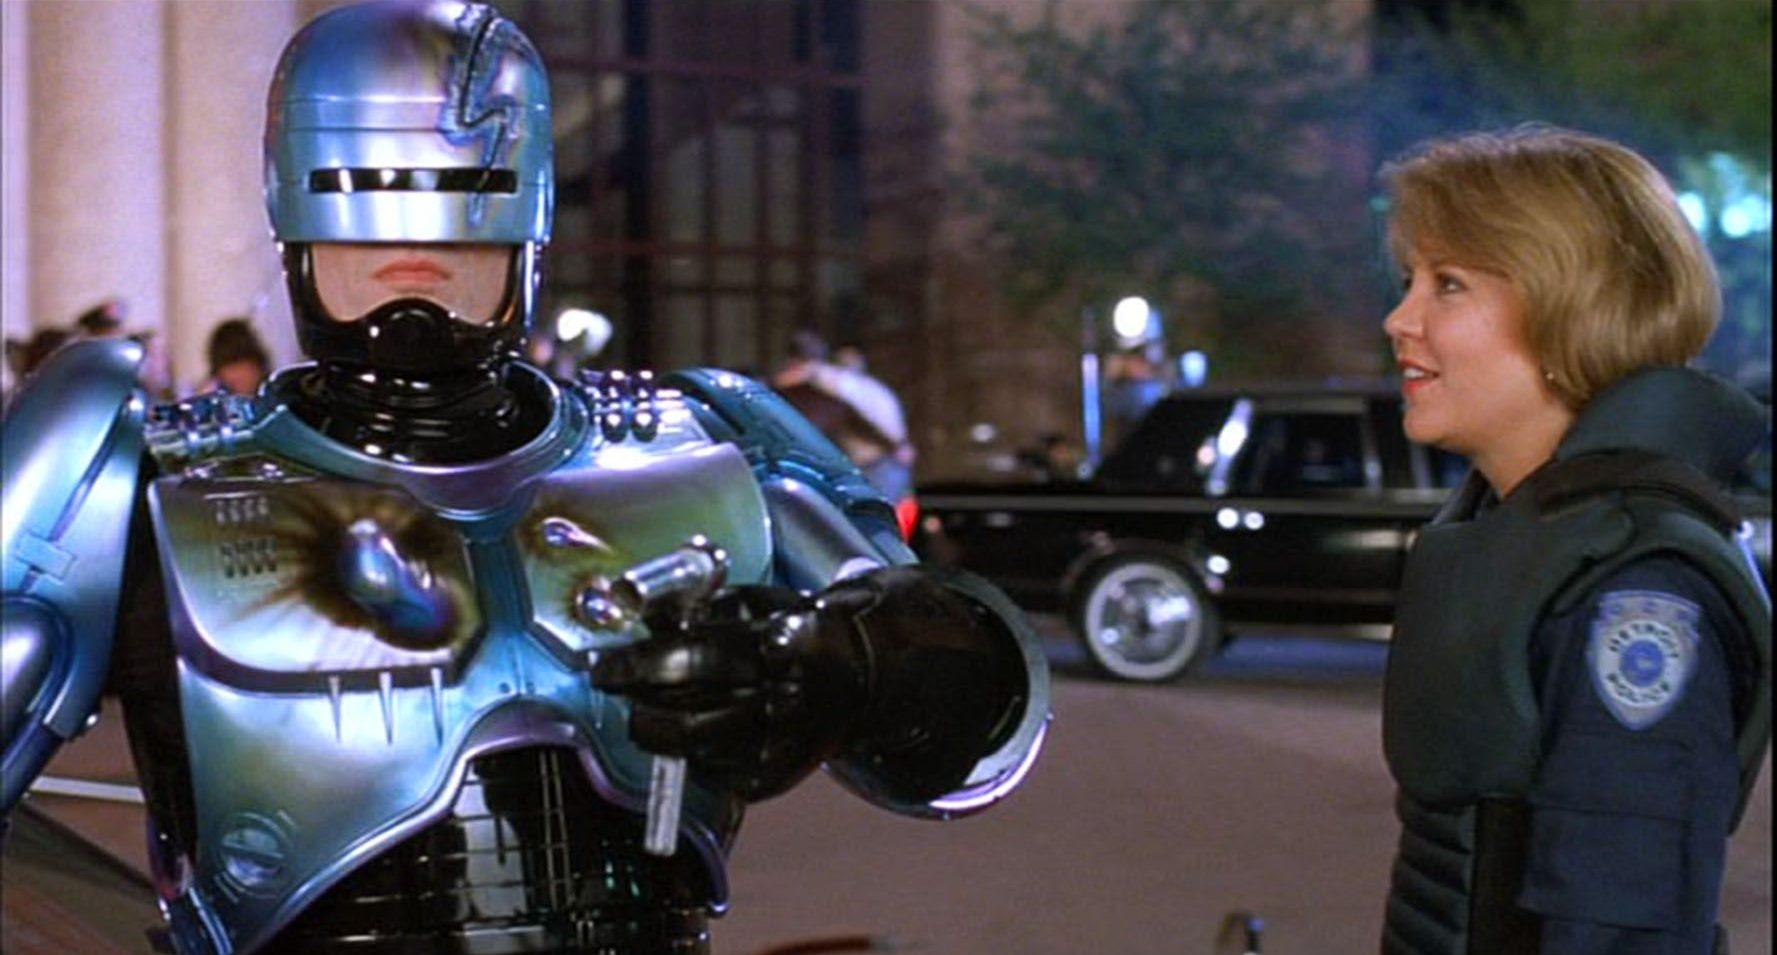 14a 1 e1609346530626 20 Futuristic Facts About RoboCop 2